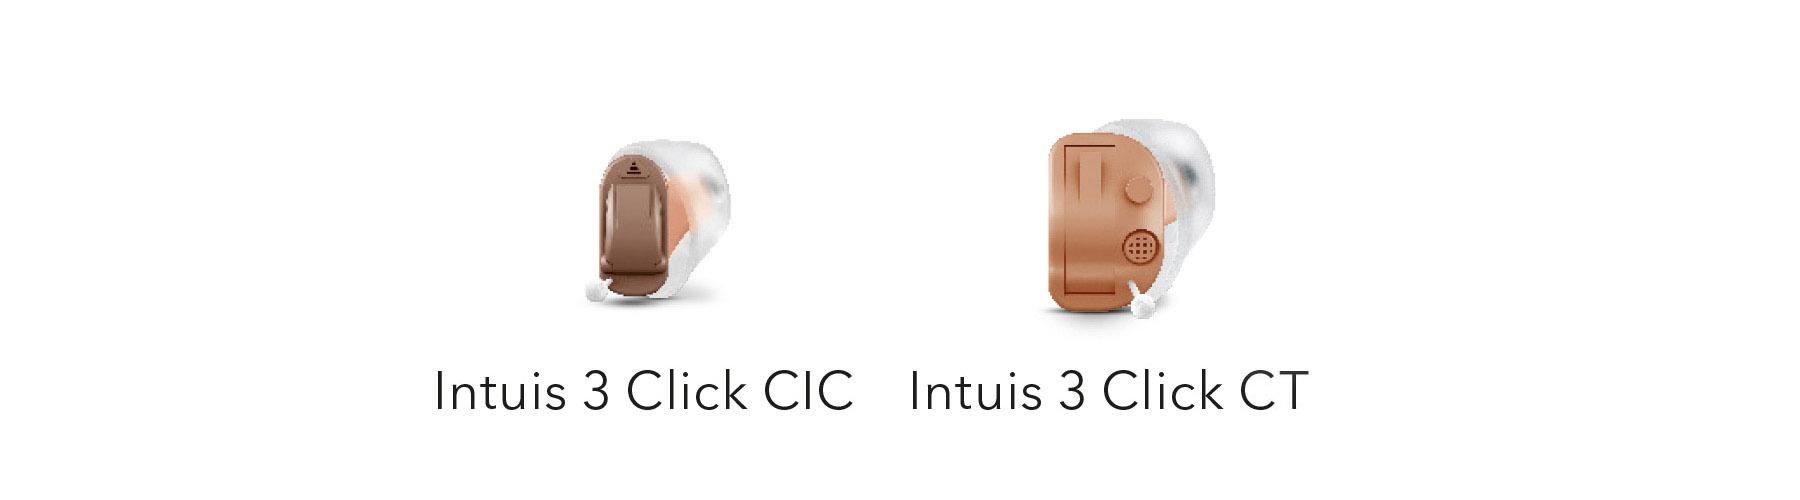 Intius3_click-cic-itc-models_1800x500px